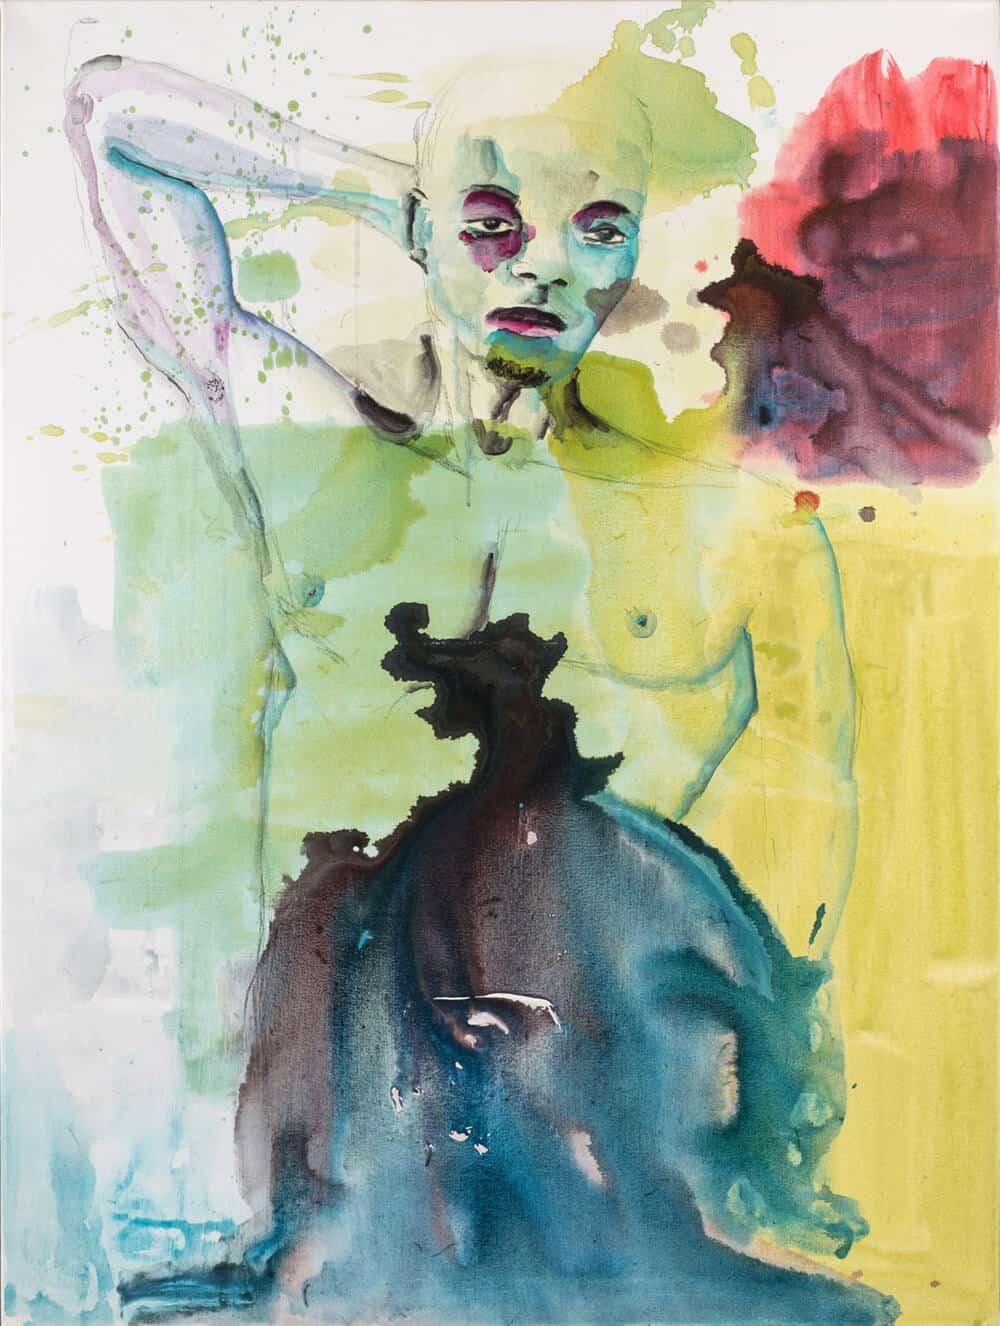 Banele Khoza, Tratando de impresionar, 2017. Acrílico sobre lienzo, 122 x 92 cm.